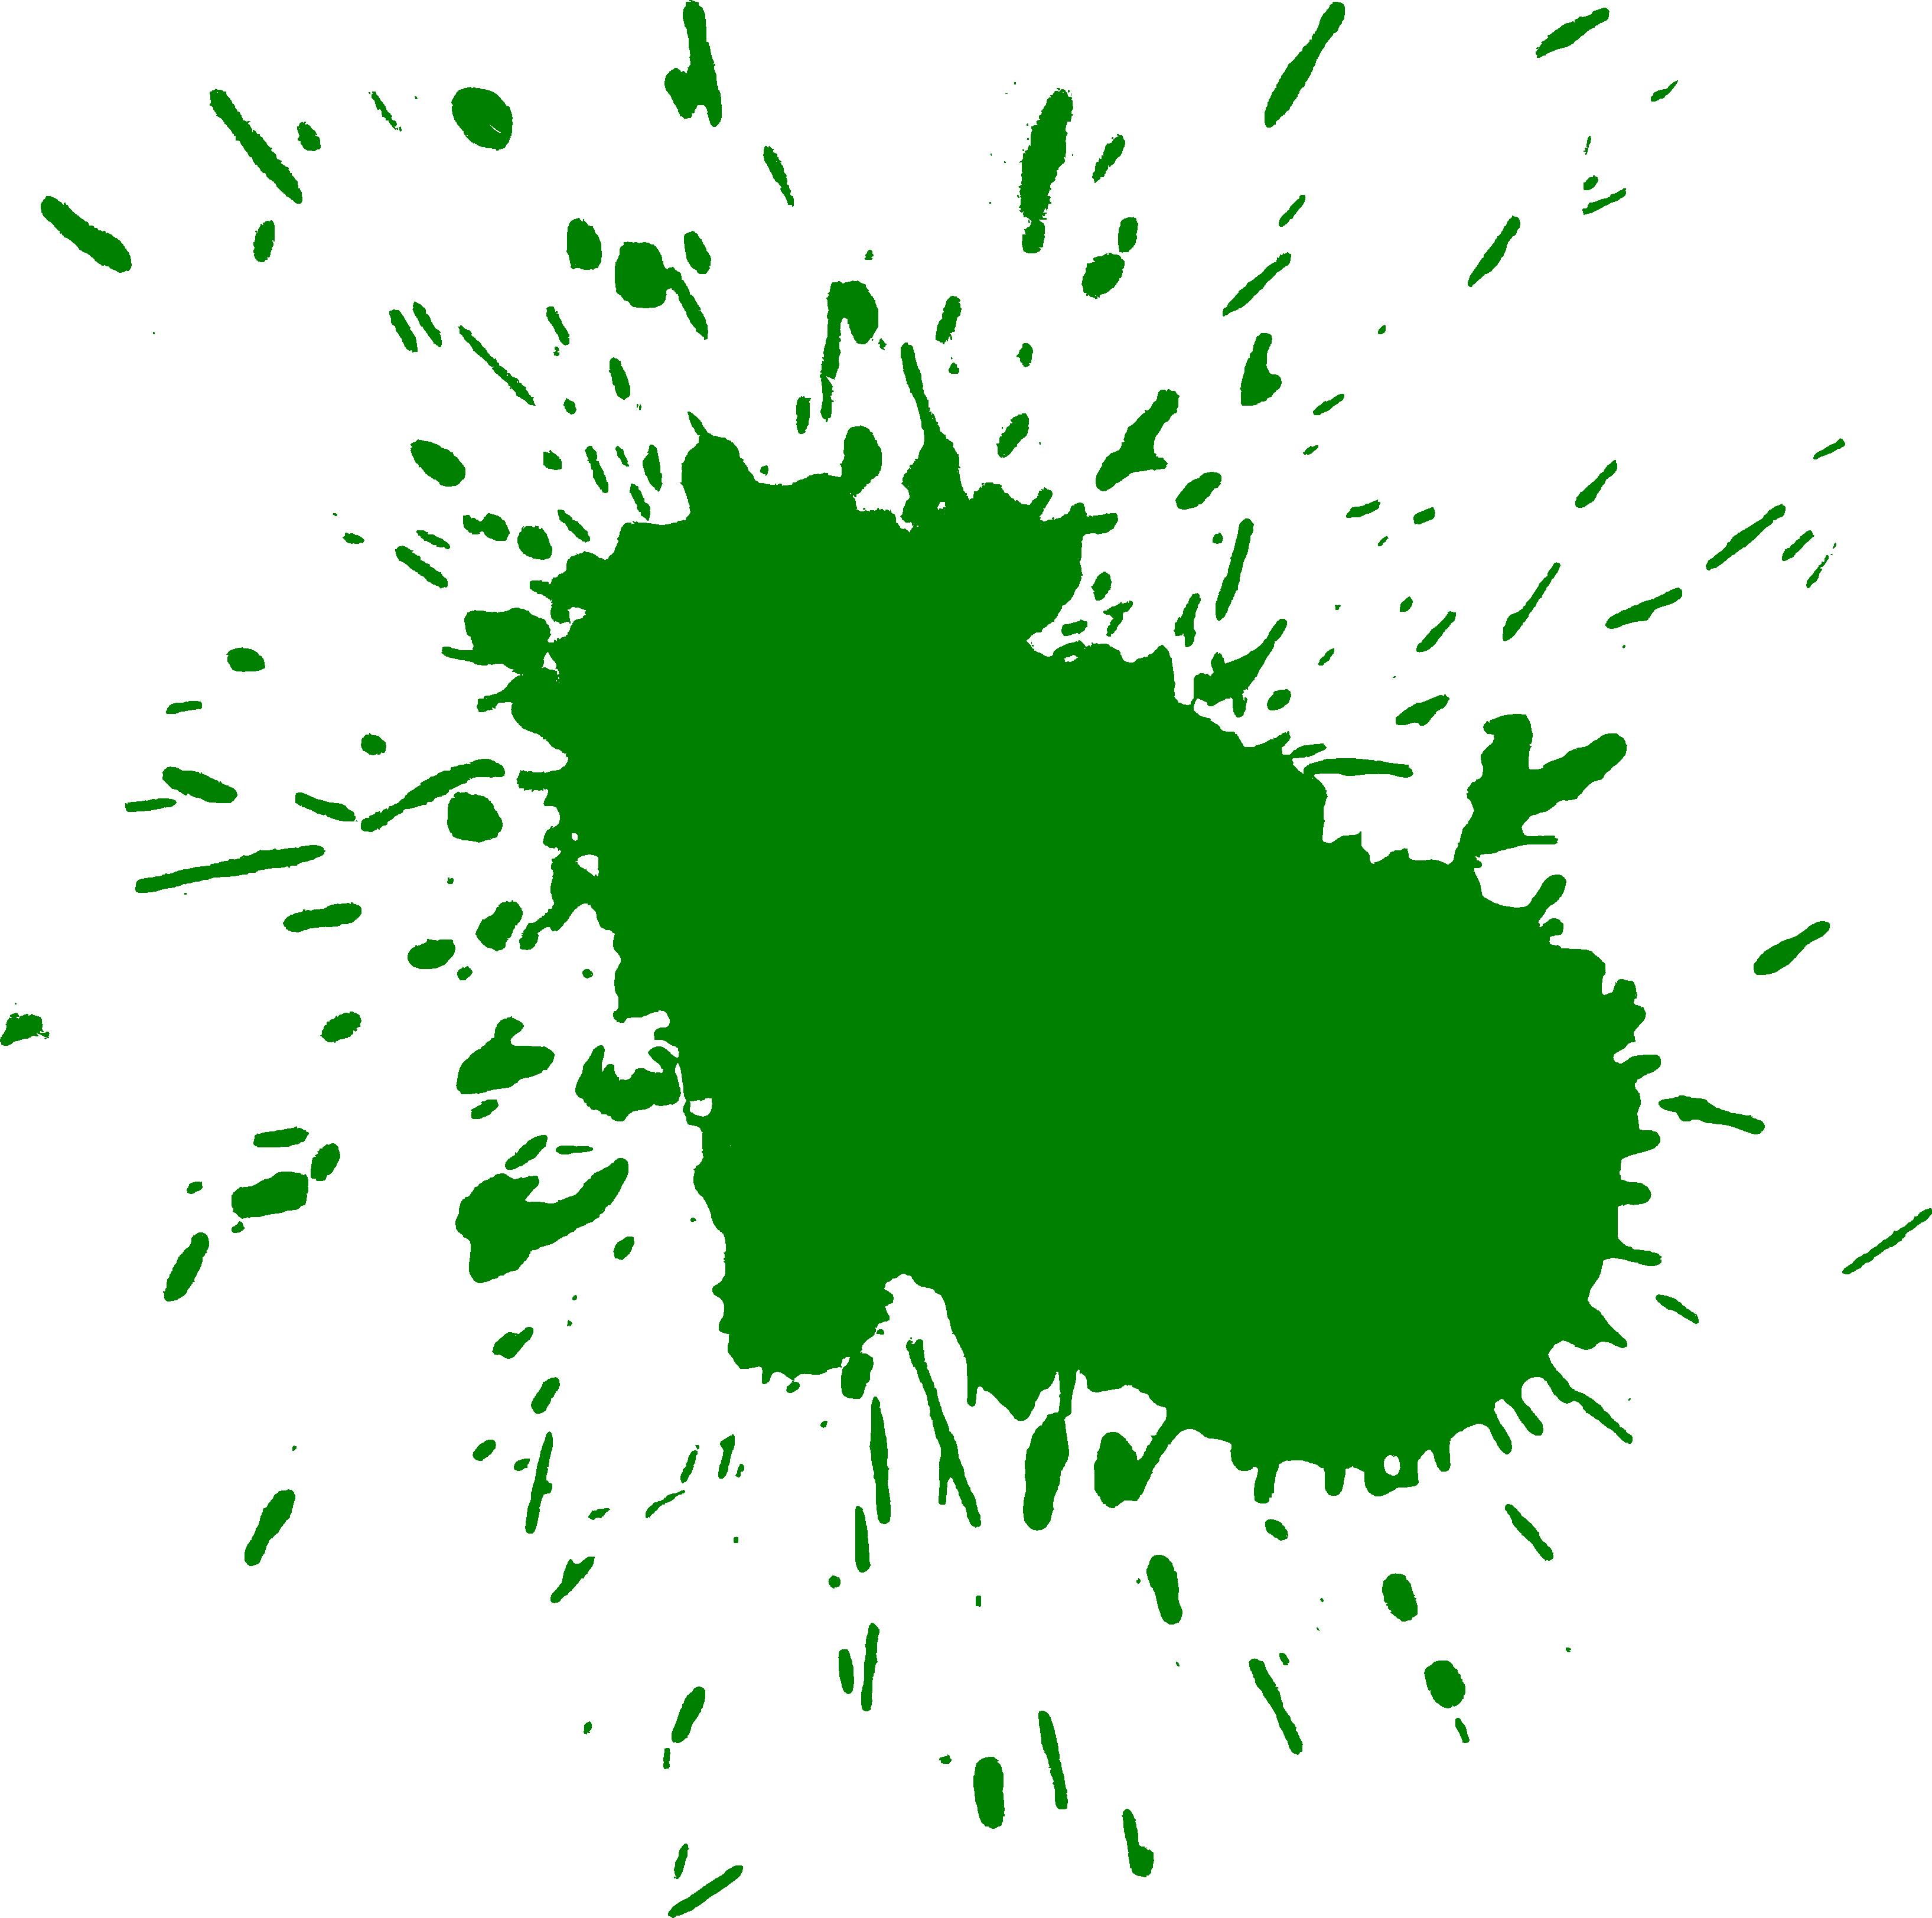 Green paint splash